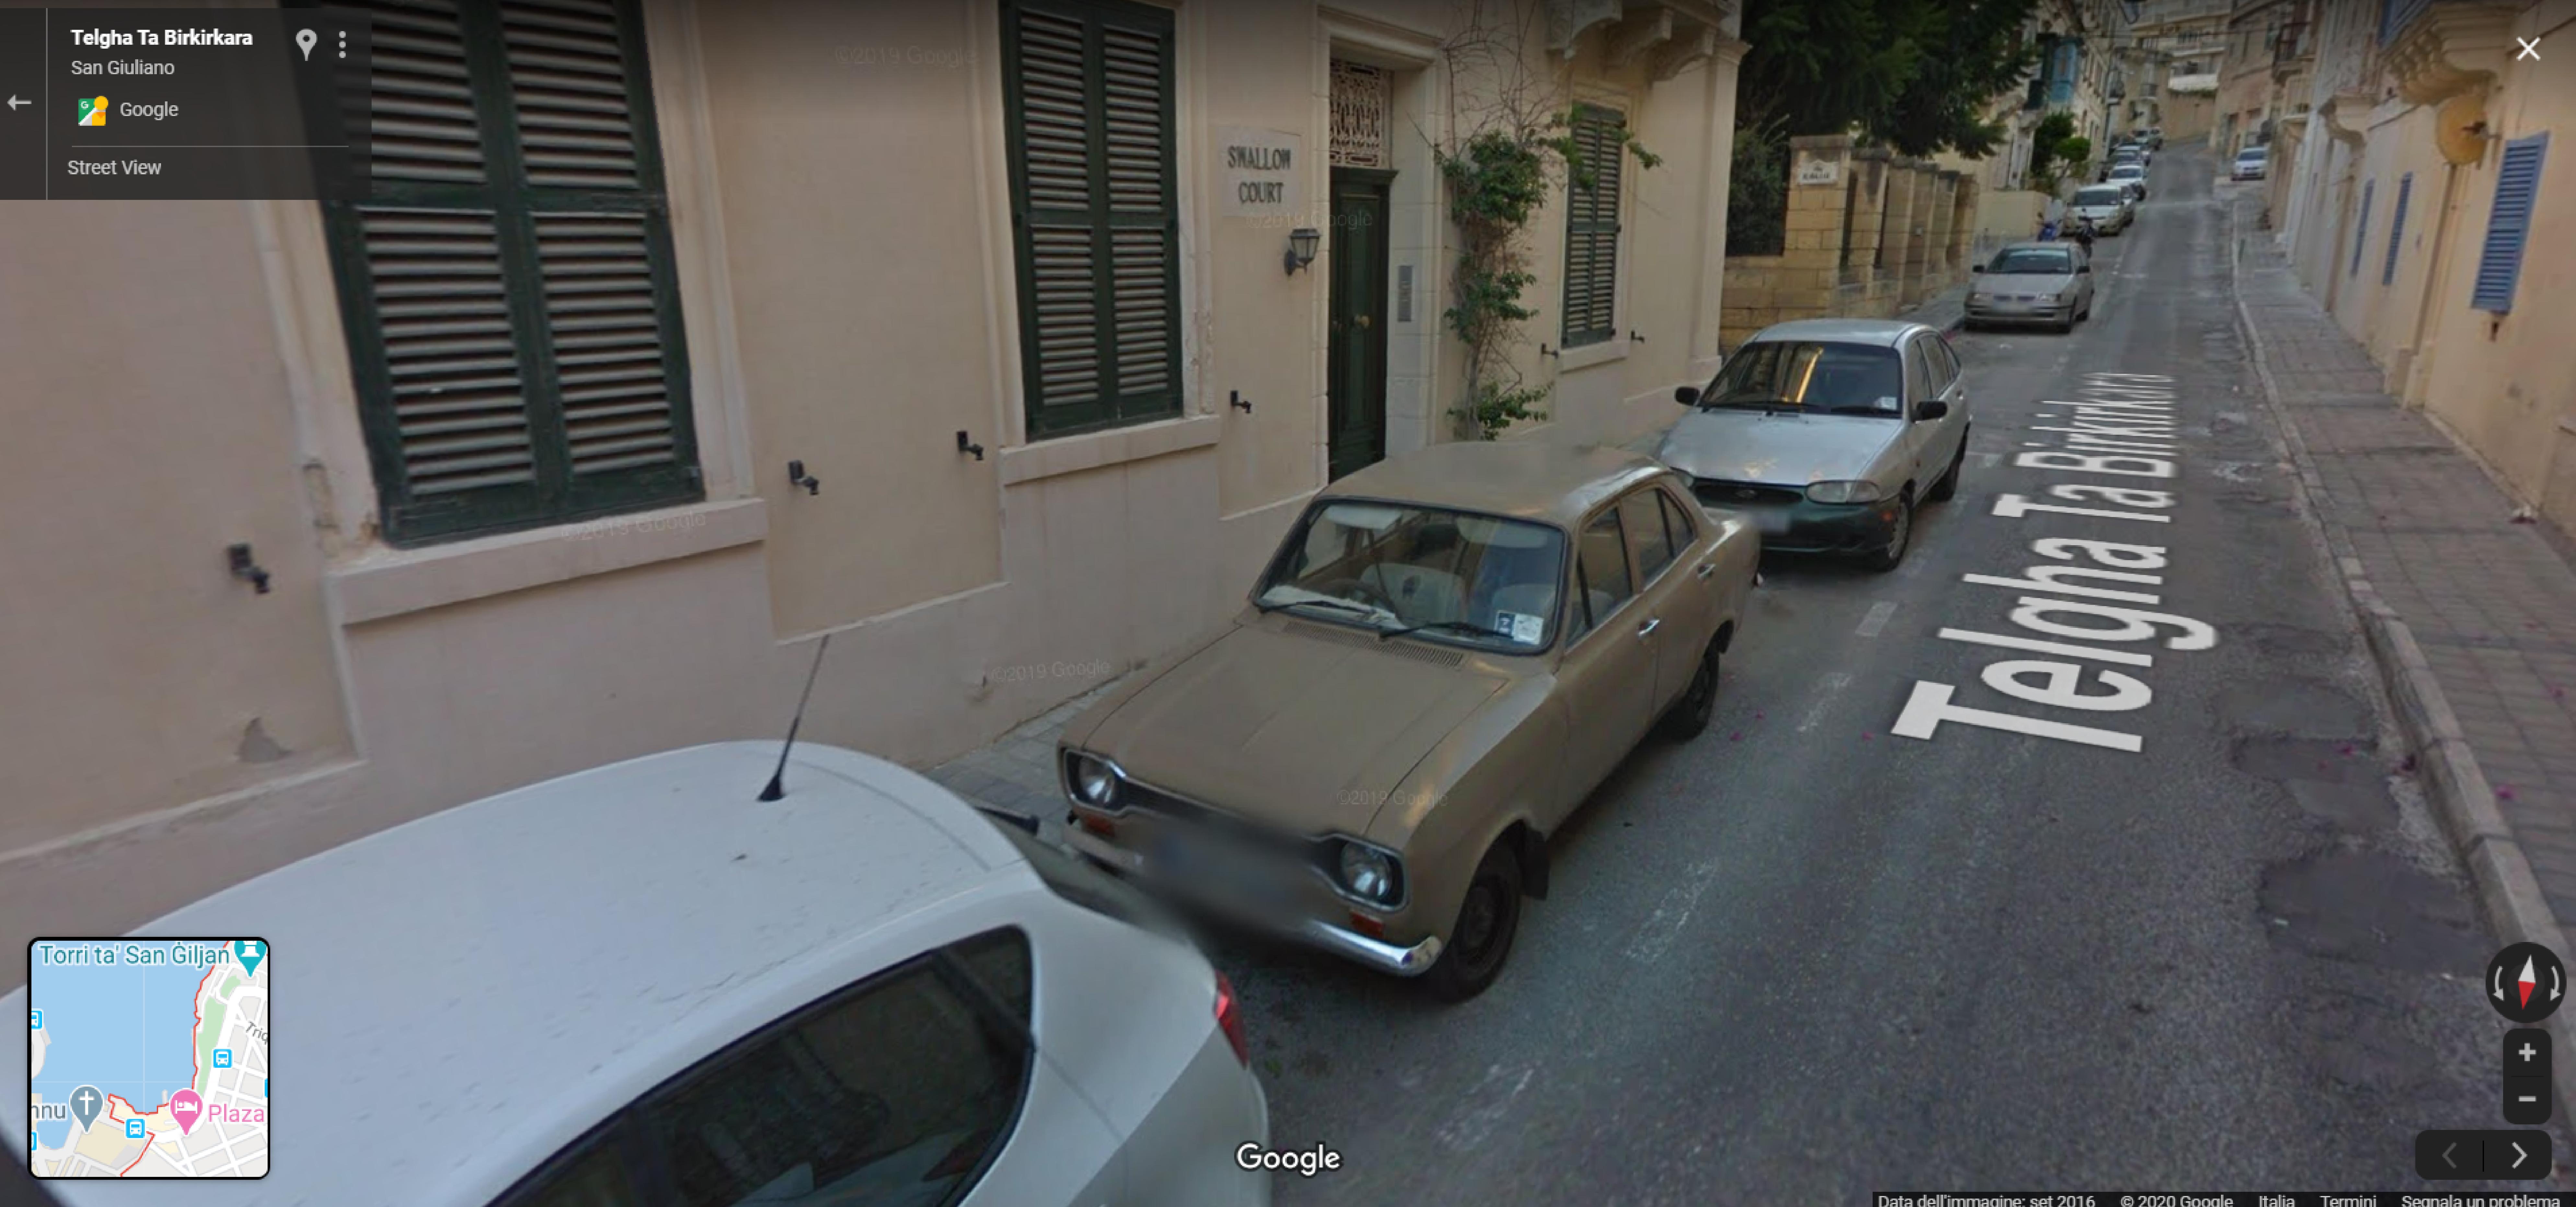 Auto  storiche da Google Maps - Pagina 11 Sliema-Malta-25